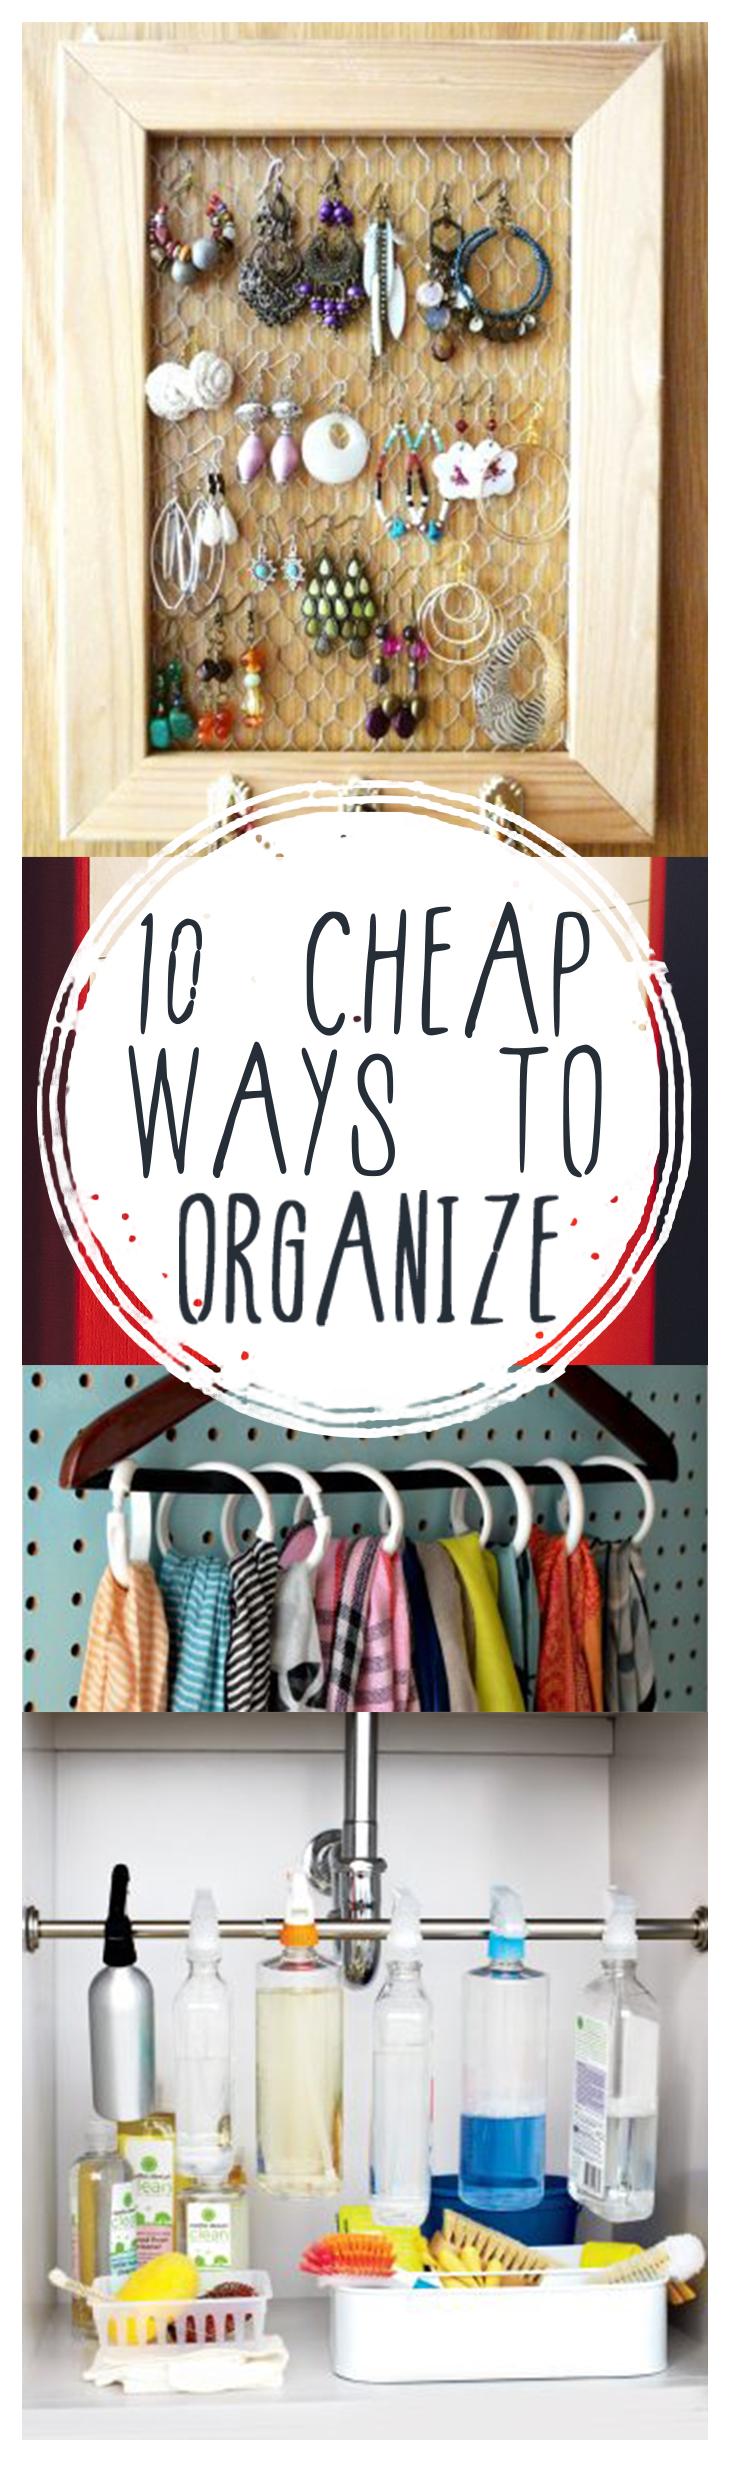 Cheap organization, cheap organization ideas, easy organization, DIY organization, frugal organization, popular pin, frugal living, home organization.